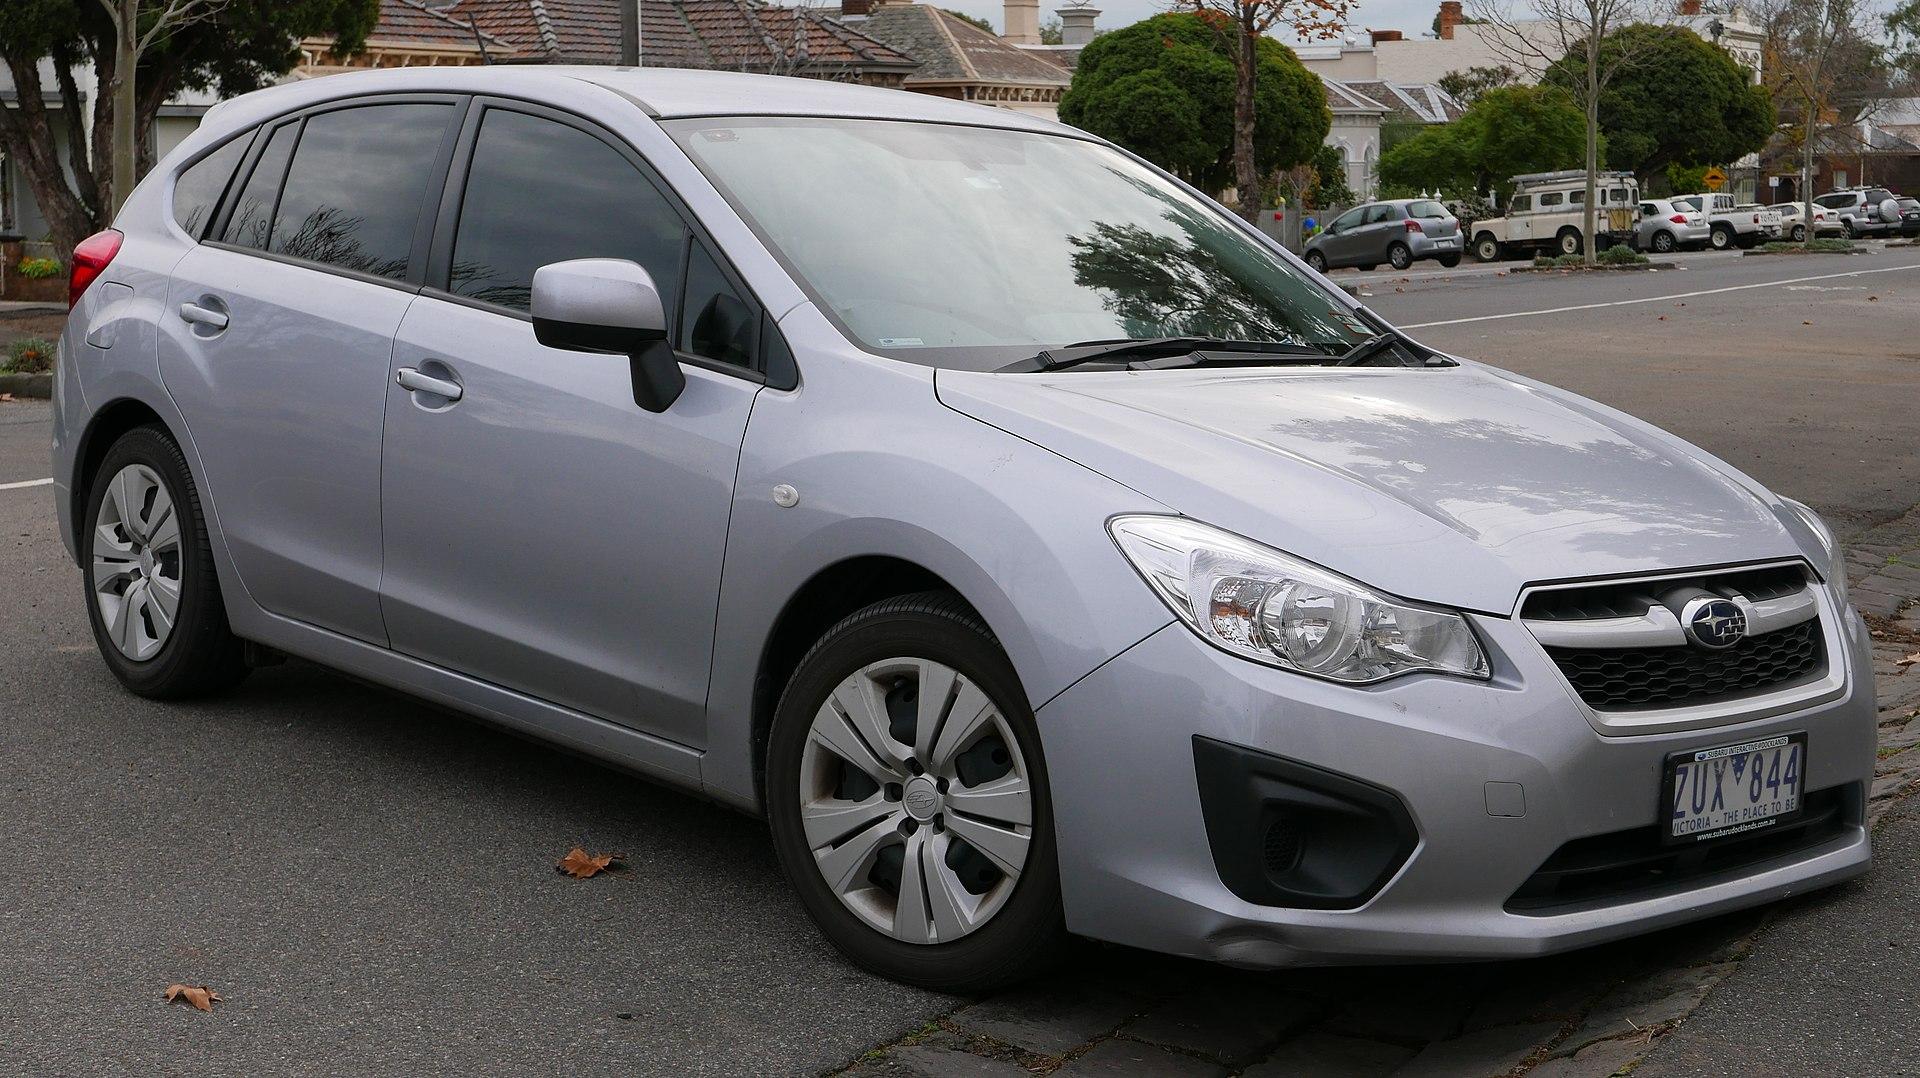 Wrx Cvt 0 60 >> 2018 Subaru Impreza WRX Limited - Sedan 2.0L Turbo AWD CVT auto